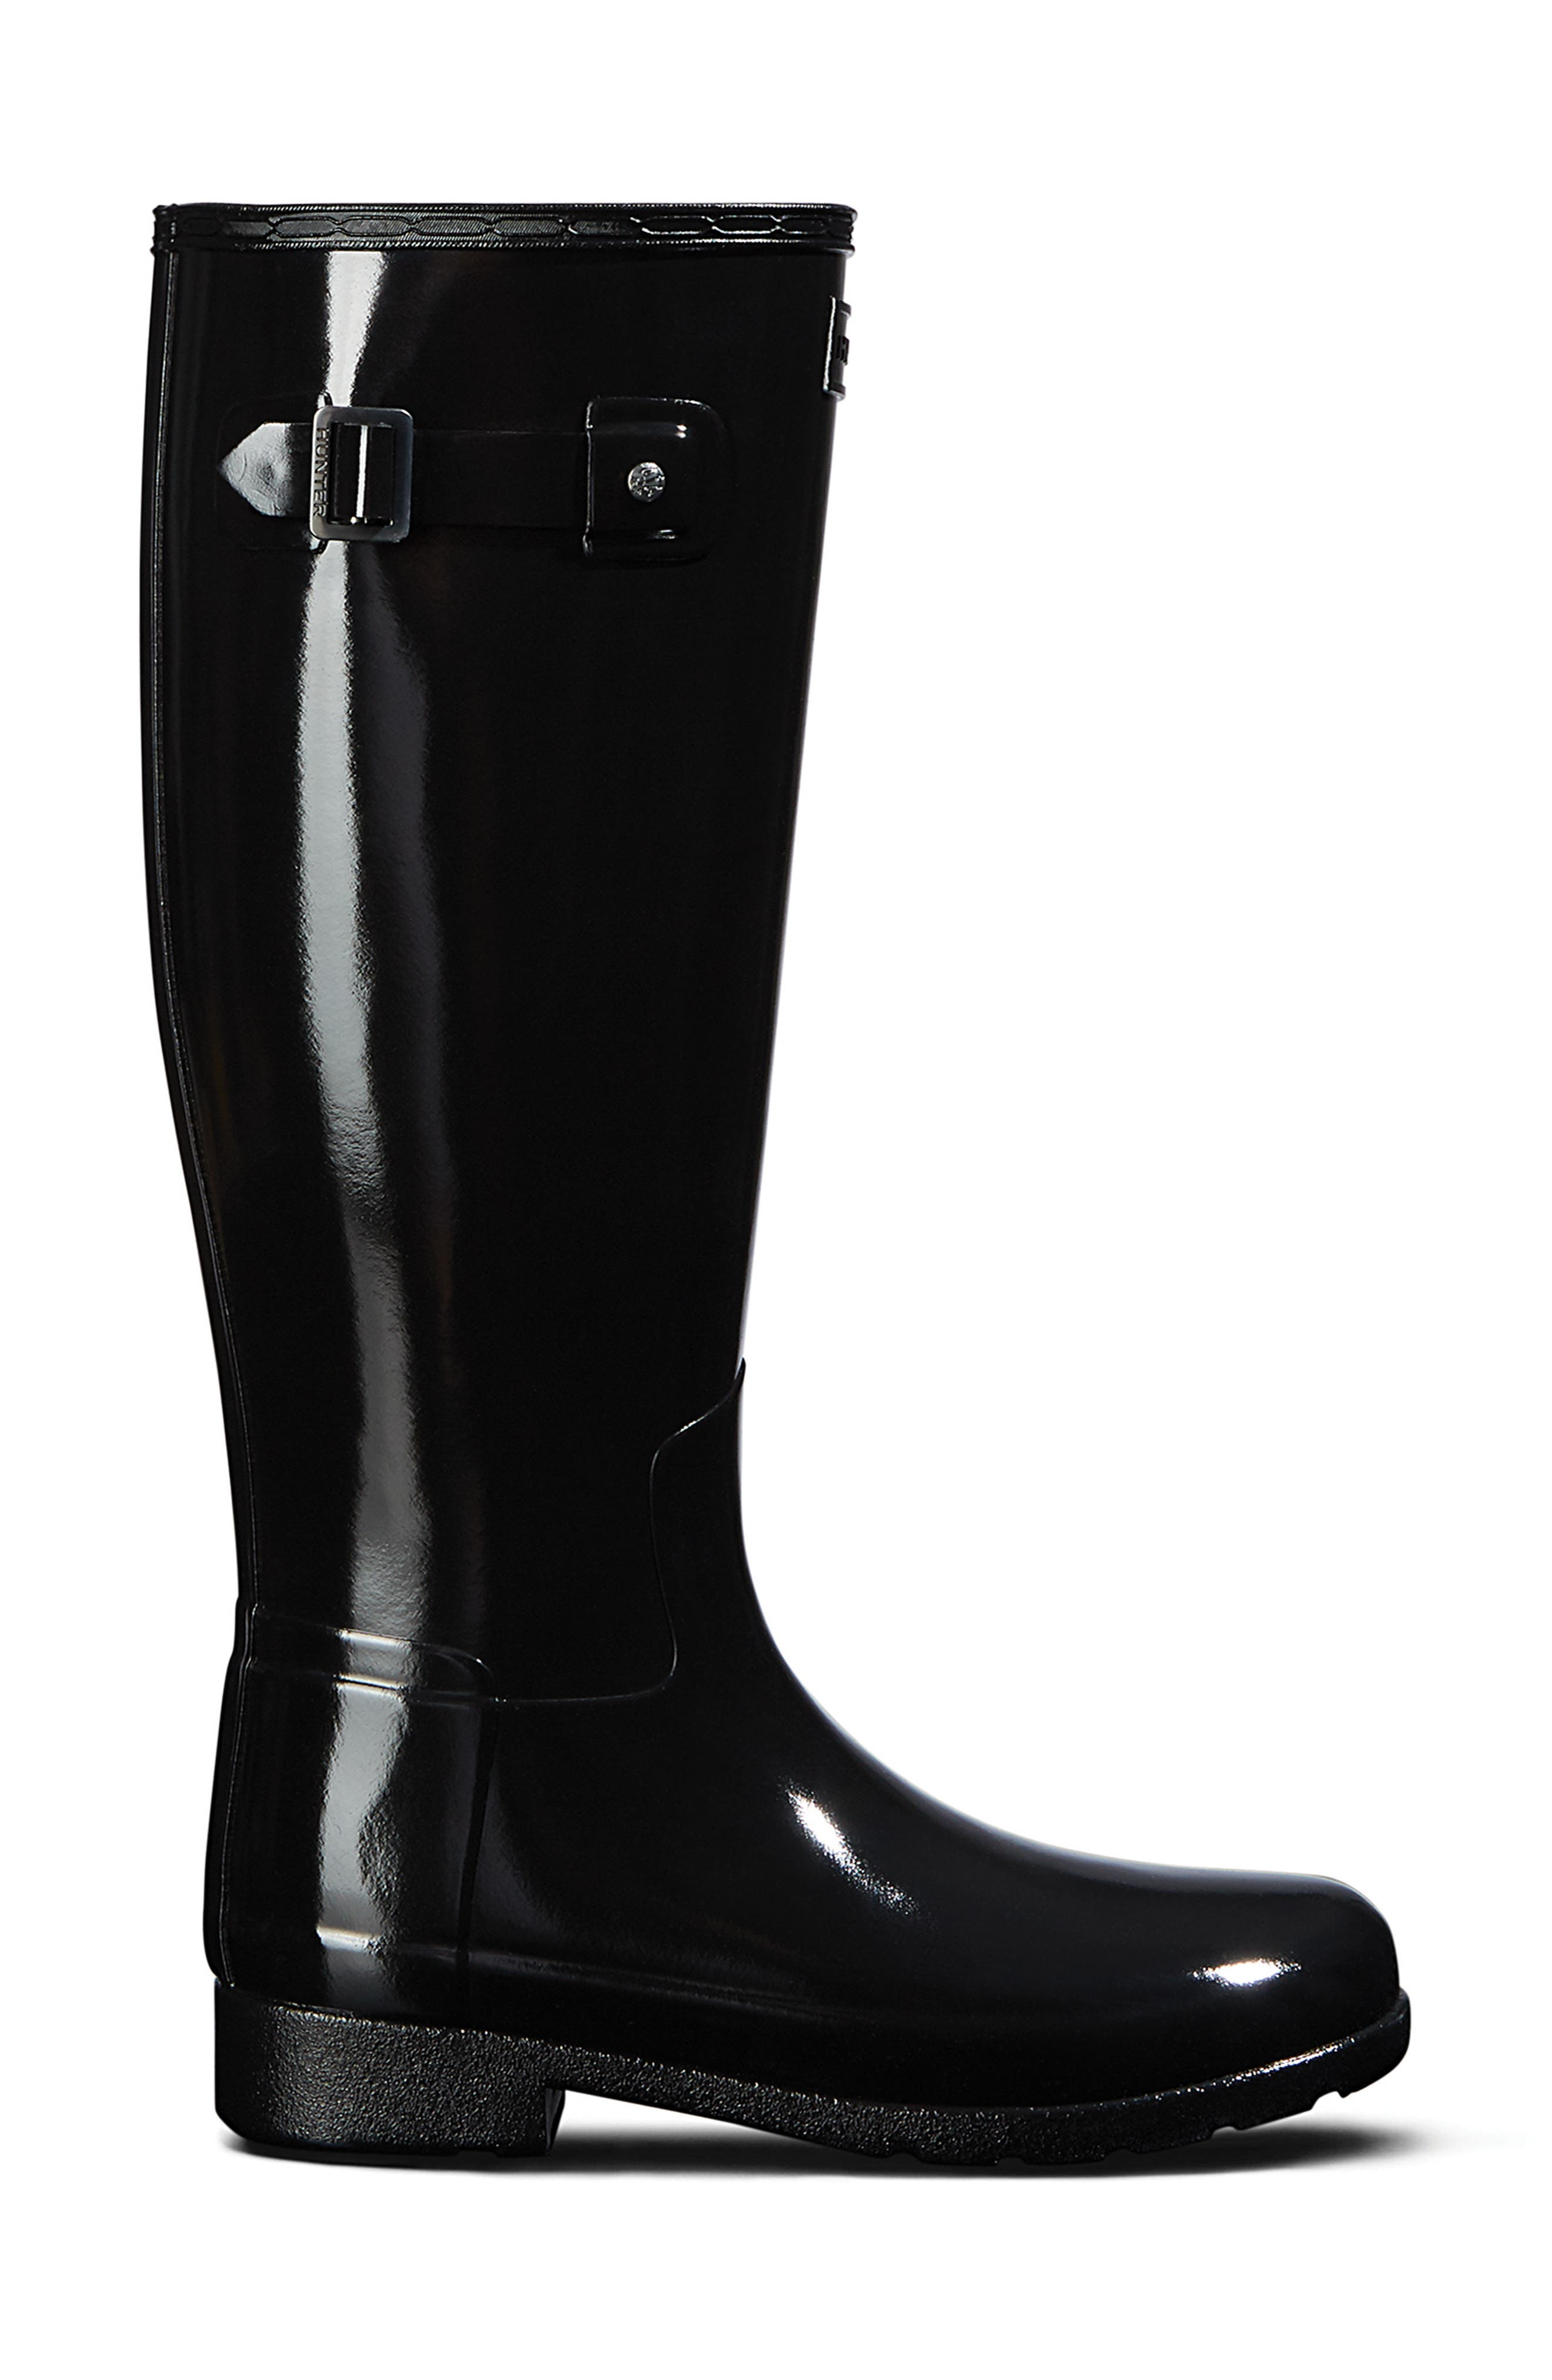 HUNTER, Original Refined Gloss Tall Waterproof Rain Boot, Alternate thumbnail 3, color, BLACK